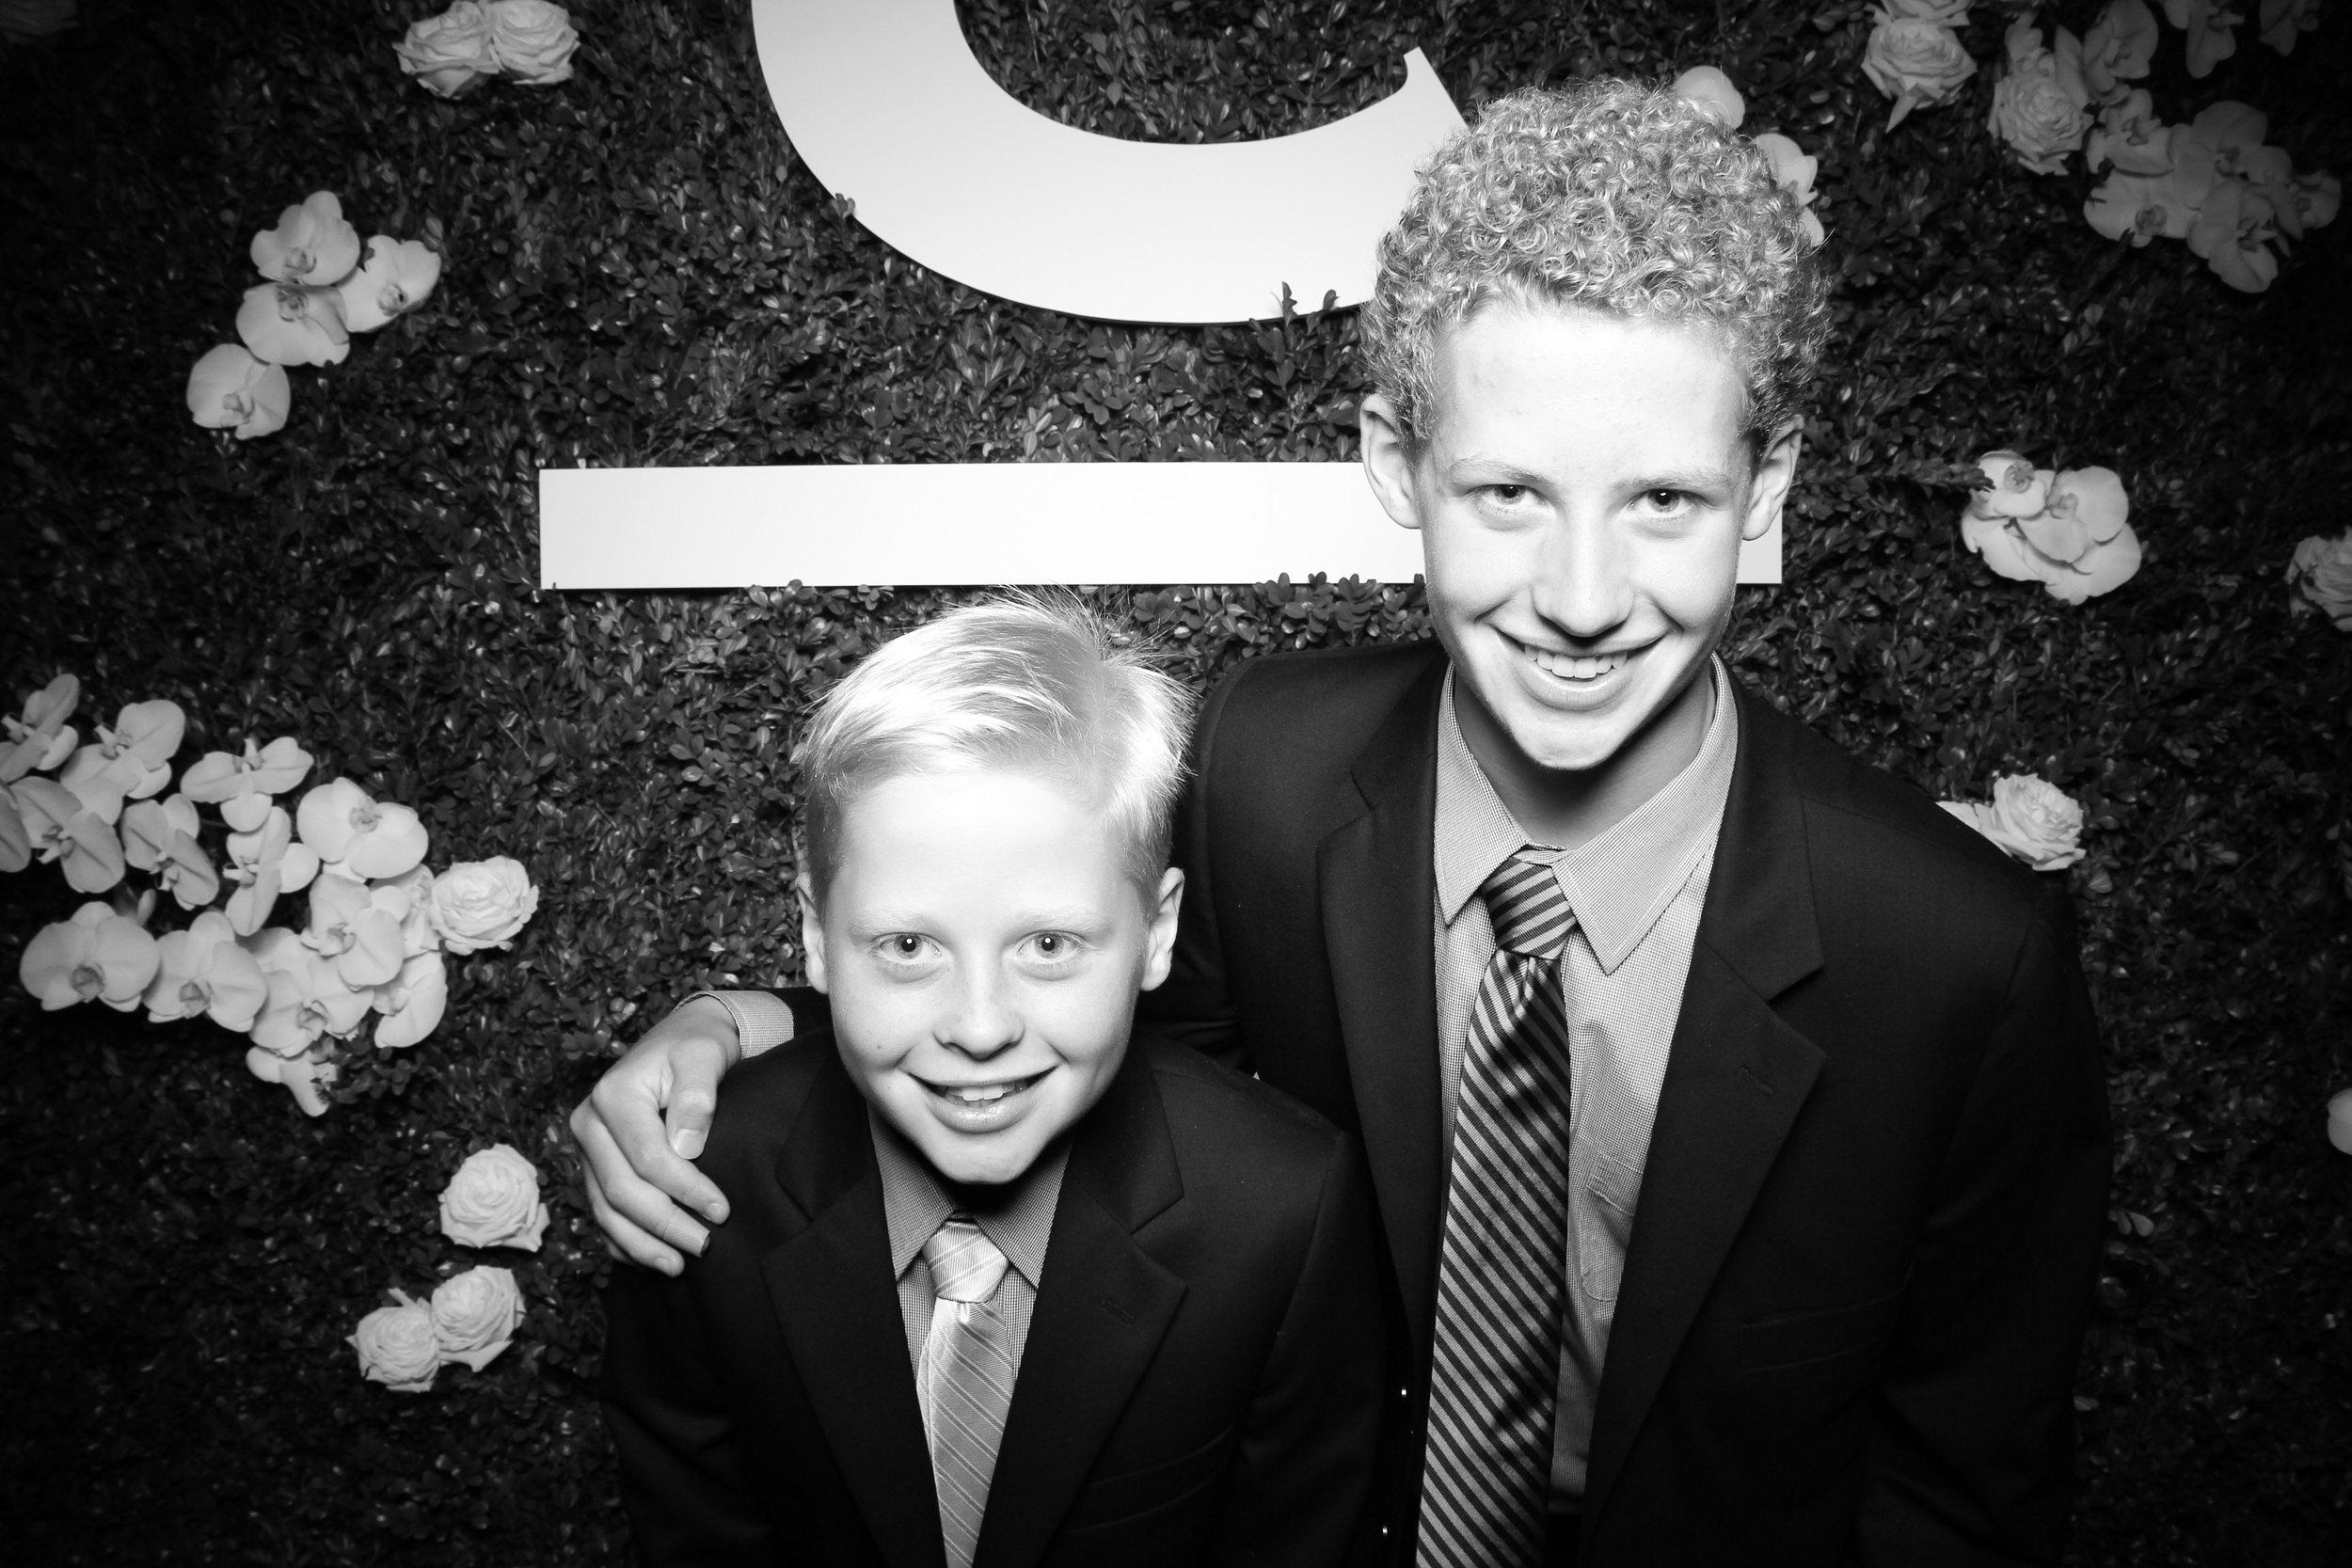 Peninsula_Hotel_Chicago_Wedding_Photo_Booth_08.jpg